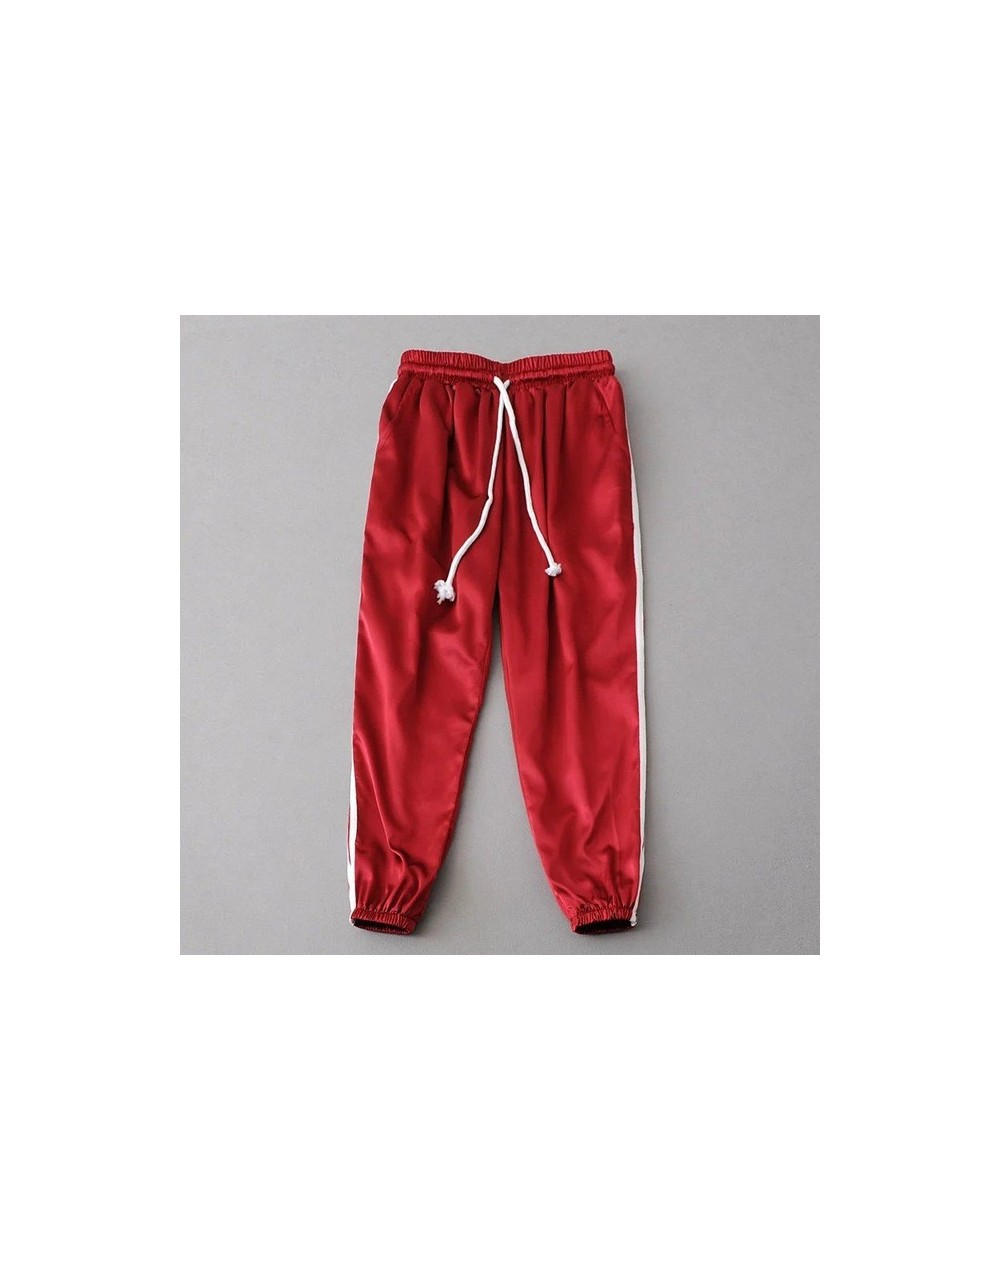 Women Sweatpants New Hot Style Casual Trousers Women Loose Slim High Waist Drawstring Harem Pants Fashion Silk Piece Pants -...